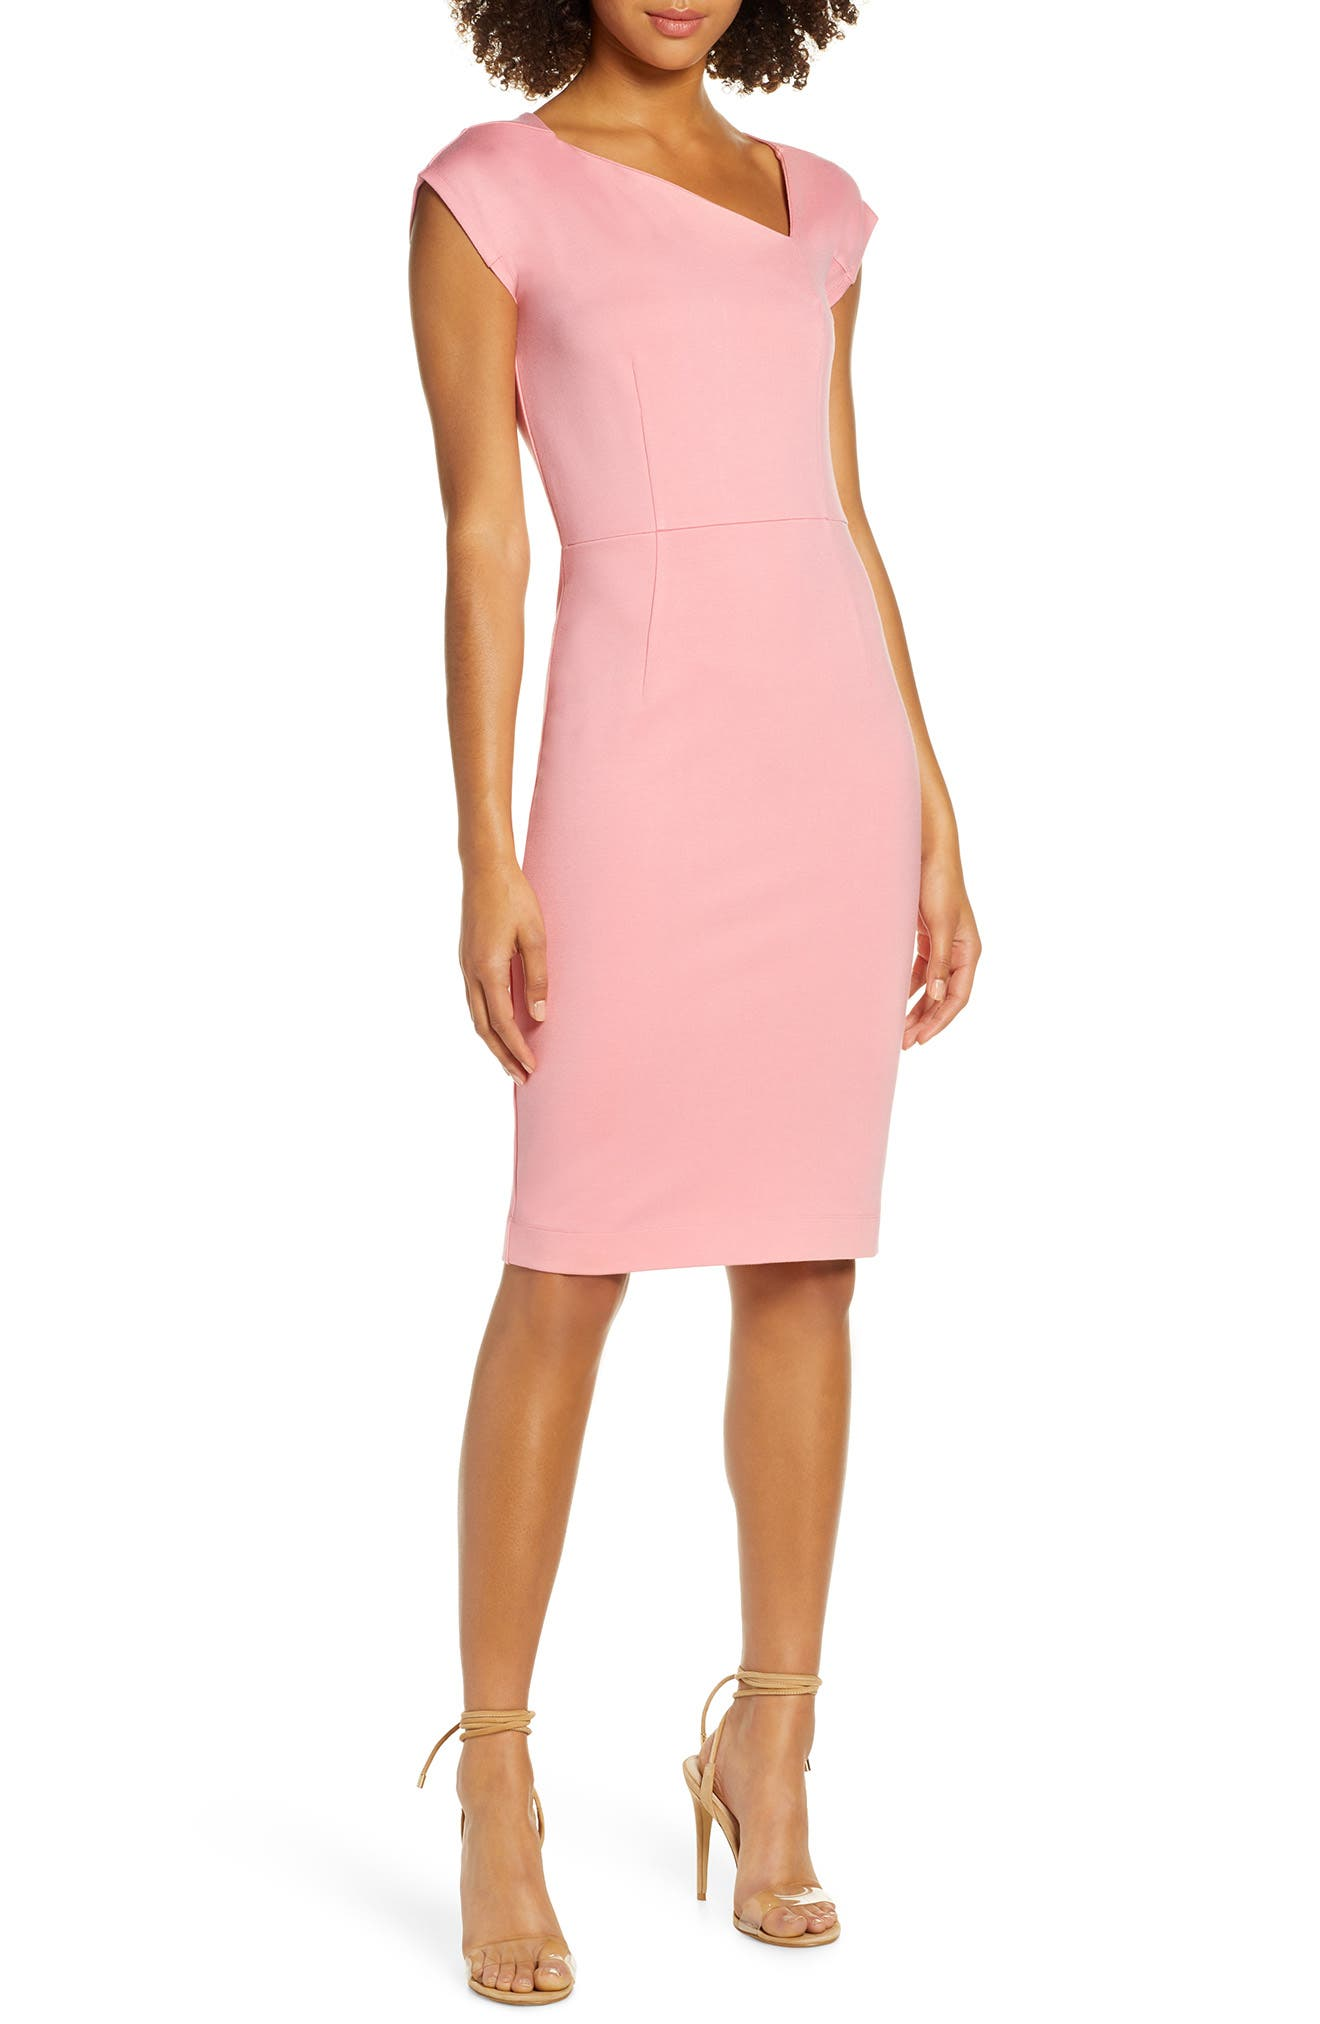 French Connection Lula Asymmetrical Neck Sheath Dress, Pink